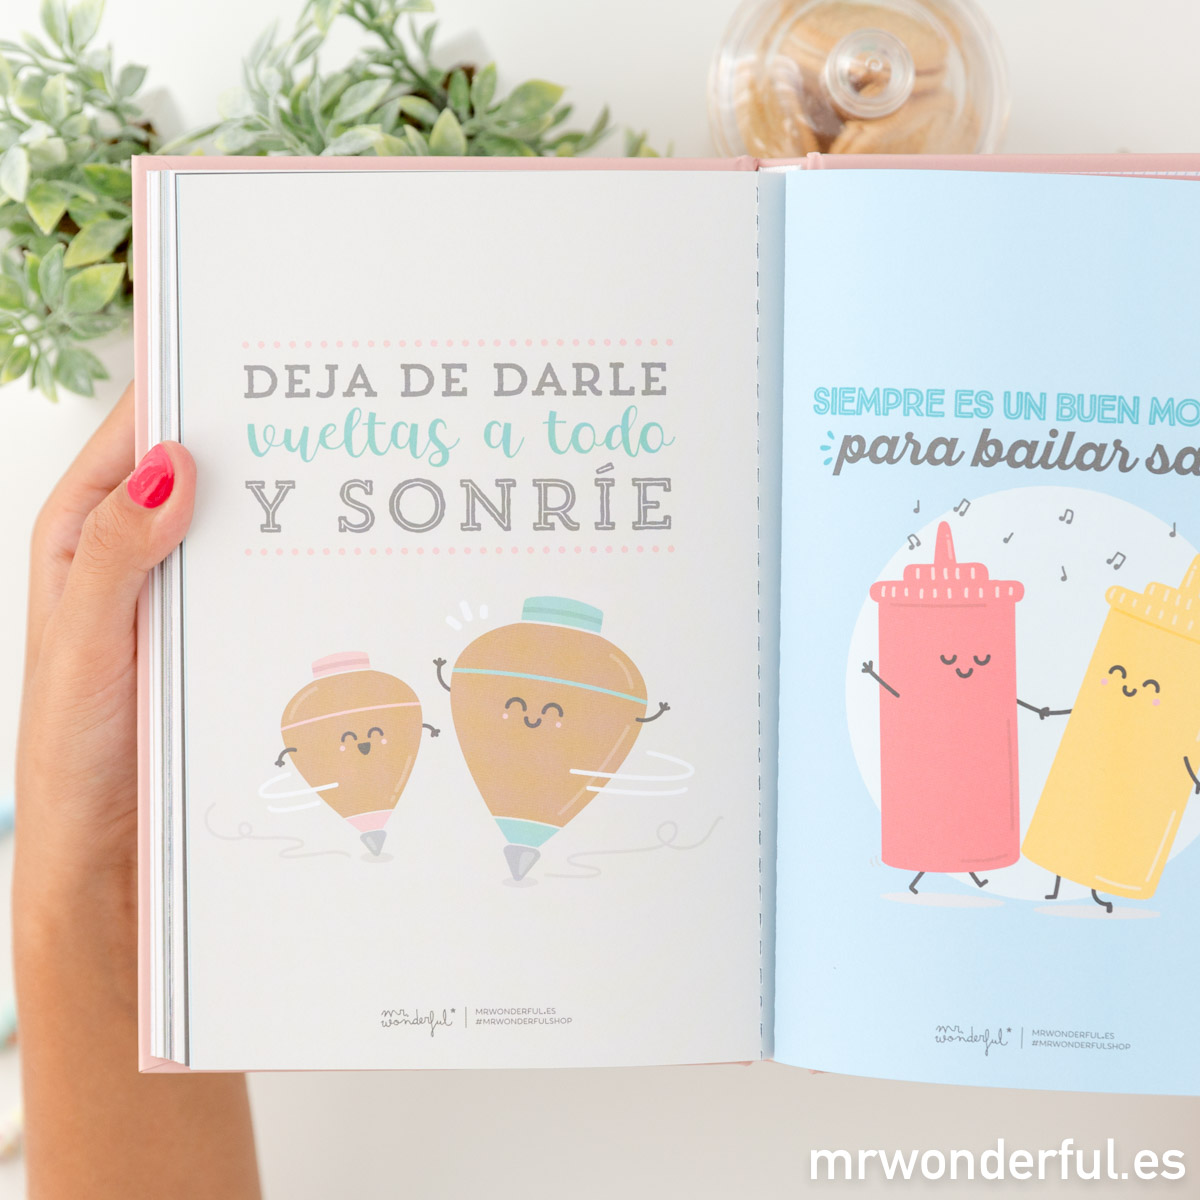 mrwonderful_9788416489725_libro-cosas-reedicion-2016-17-Editar